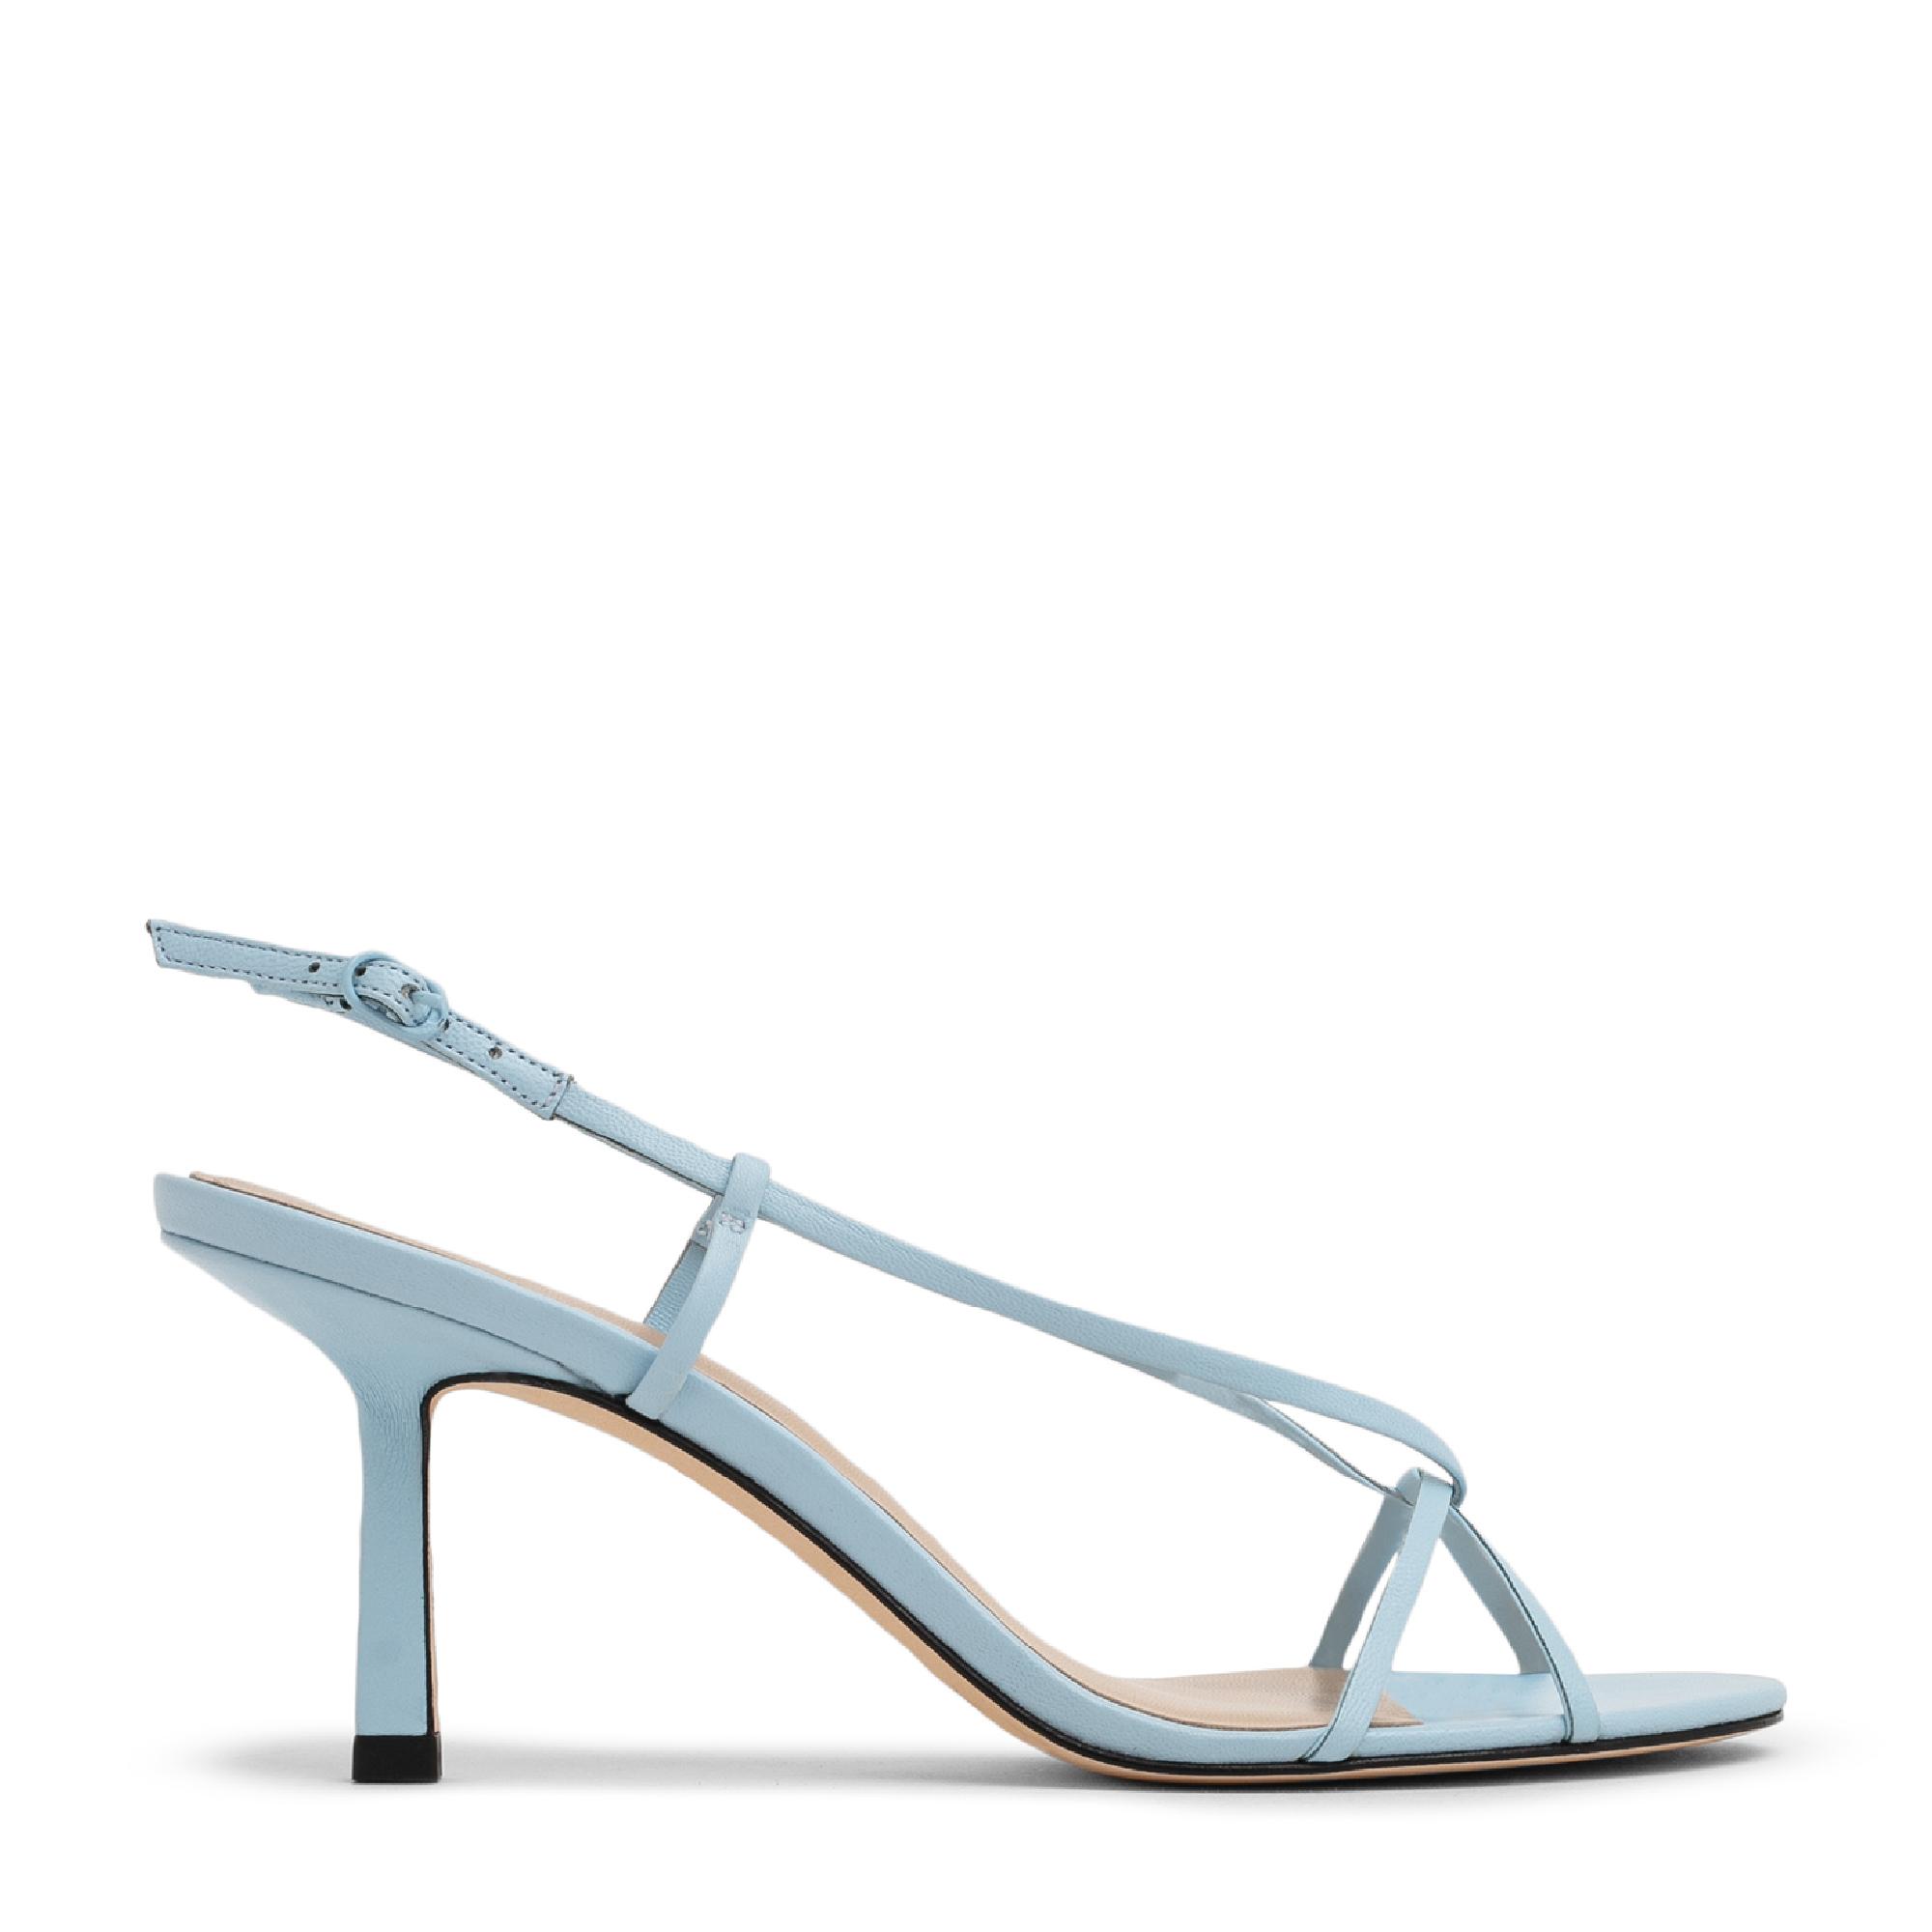 Entwined 70 heel sandals